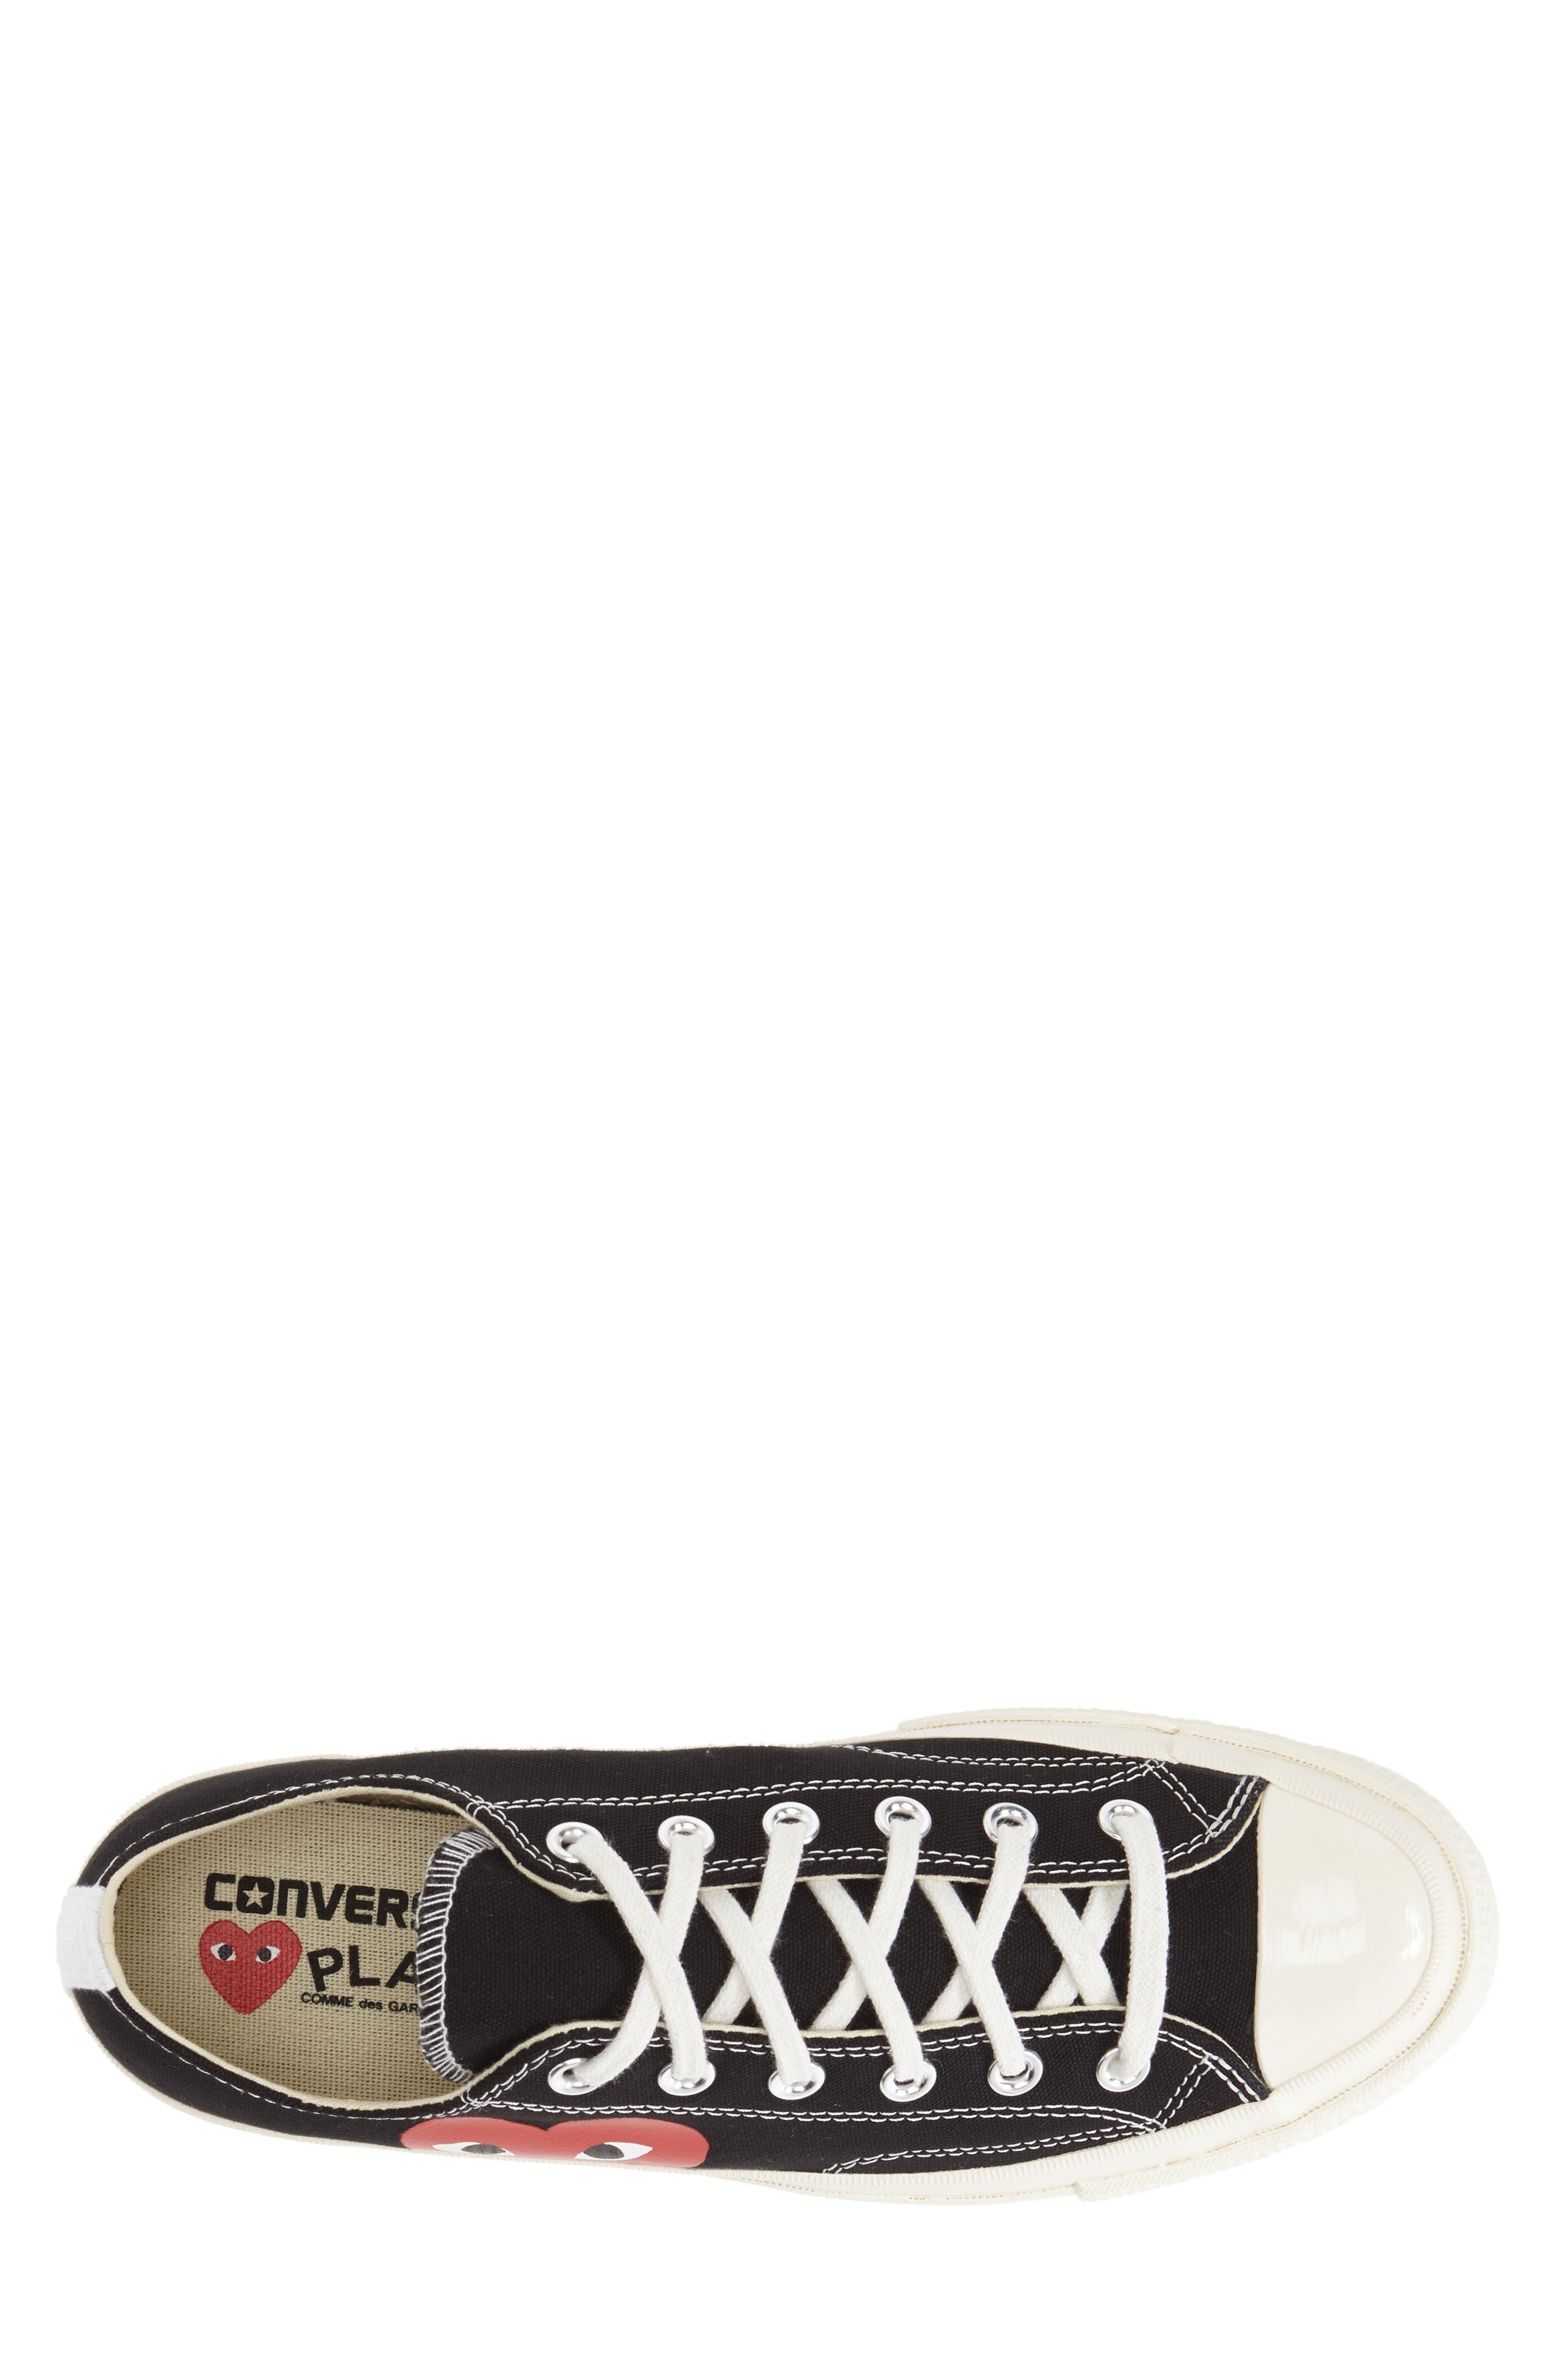 COMME DES GARÇONS PLAY, x Converse Chuck Taylor<sup>®</sup> Hidden Heart Low Top Sneaker, Alternate thumbnail 2, color, BLACK